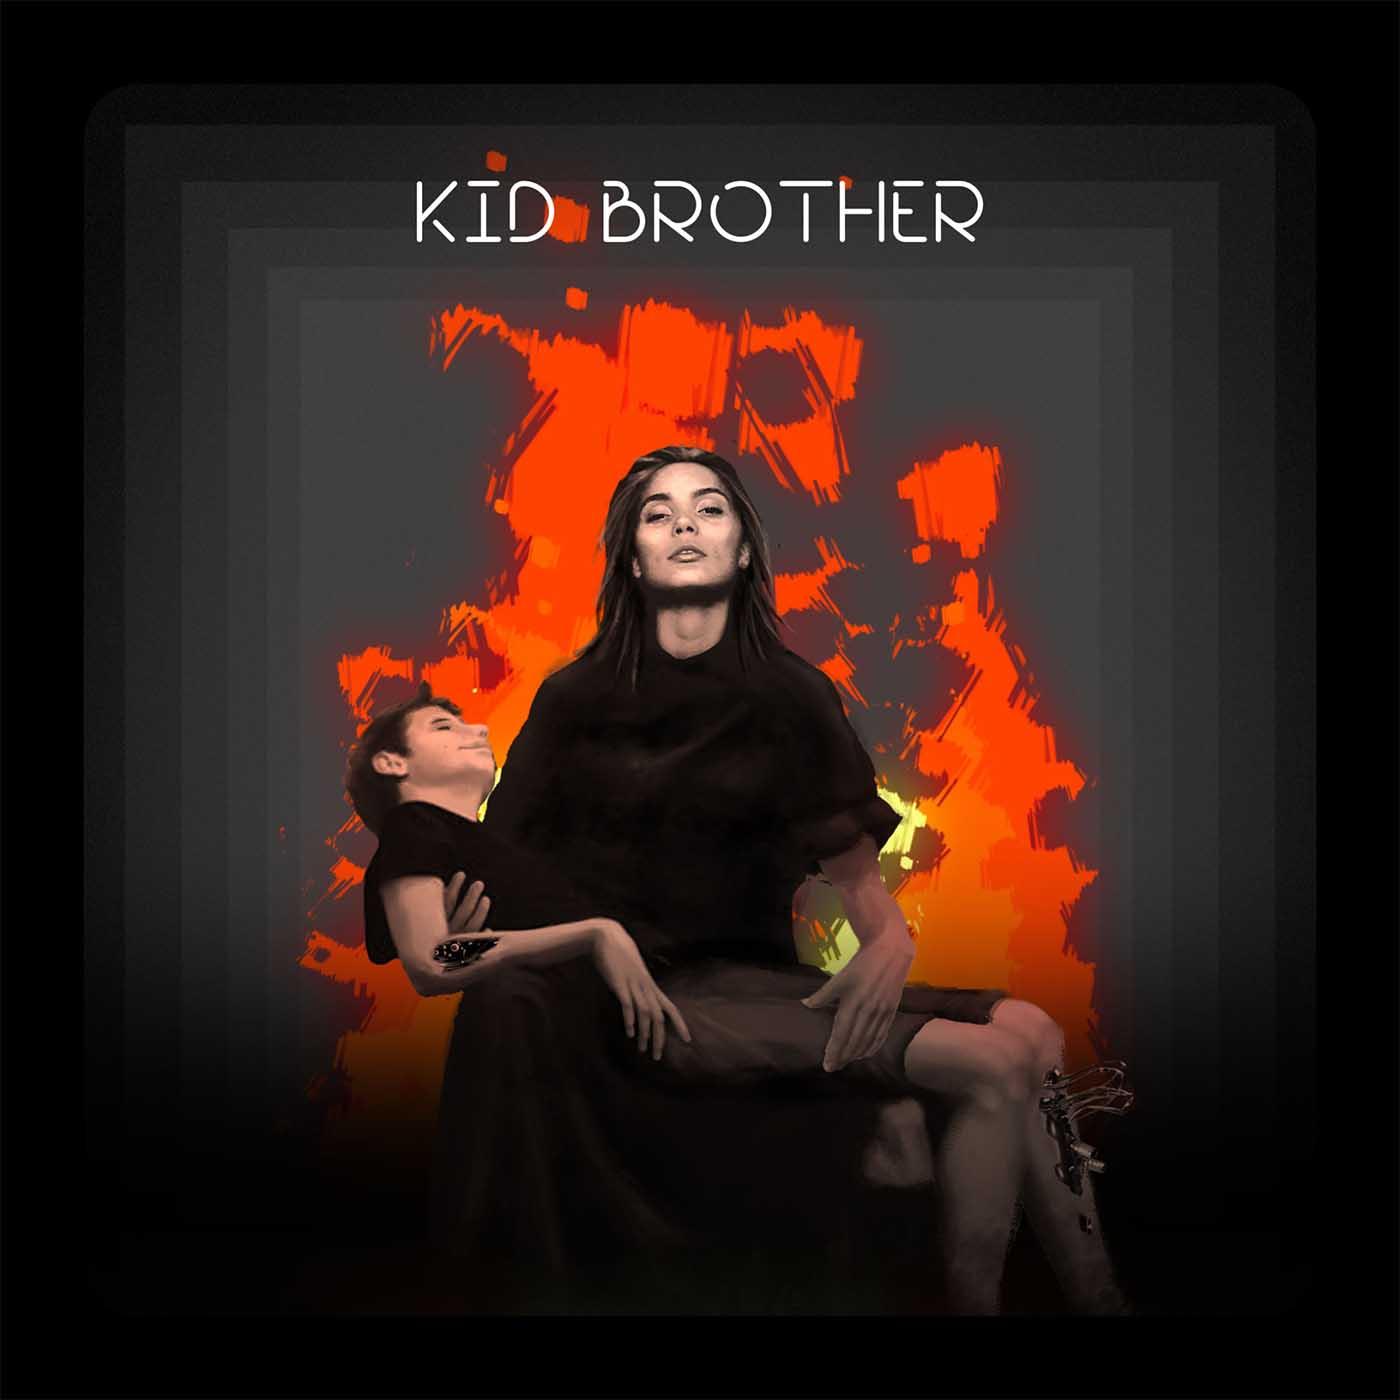 KID BROTHER  |  برادر کوچک